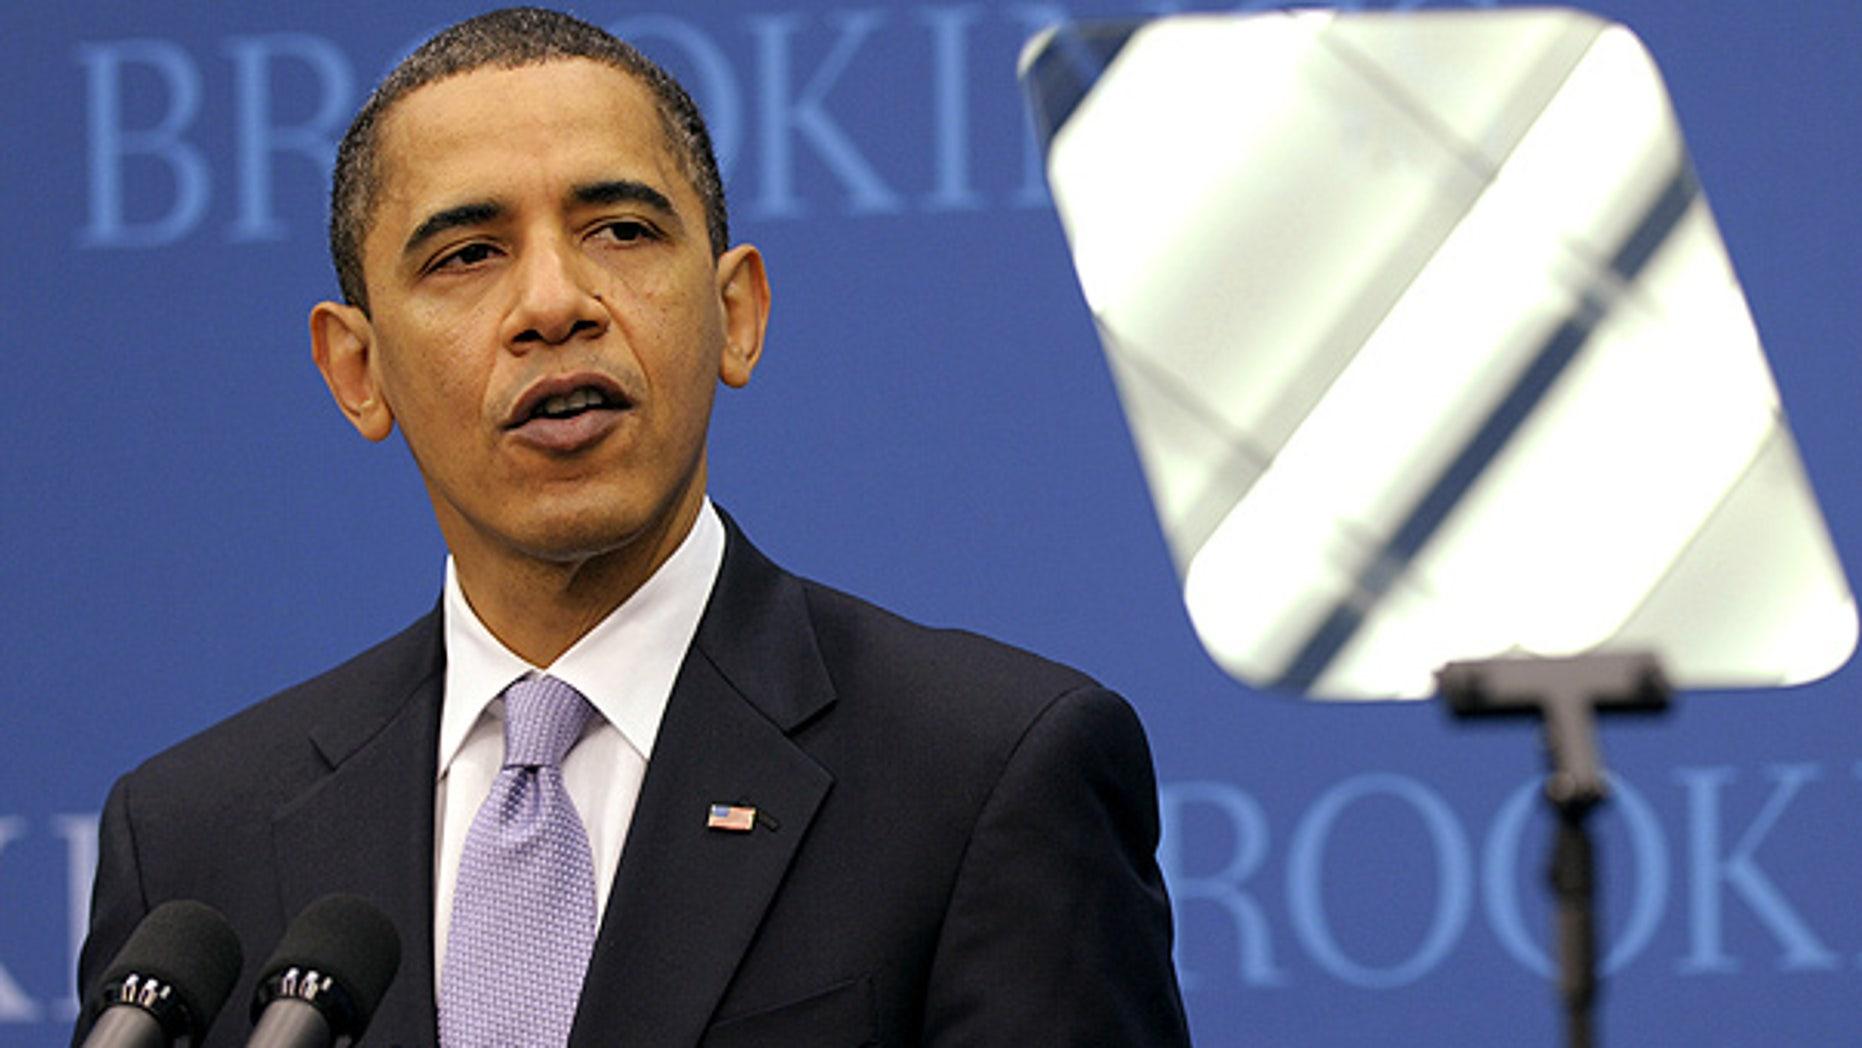 Dec. 8: President Obama speaks at the Brookings Institution in Washington. (AP)